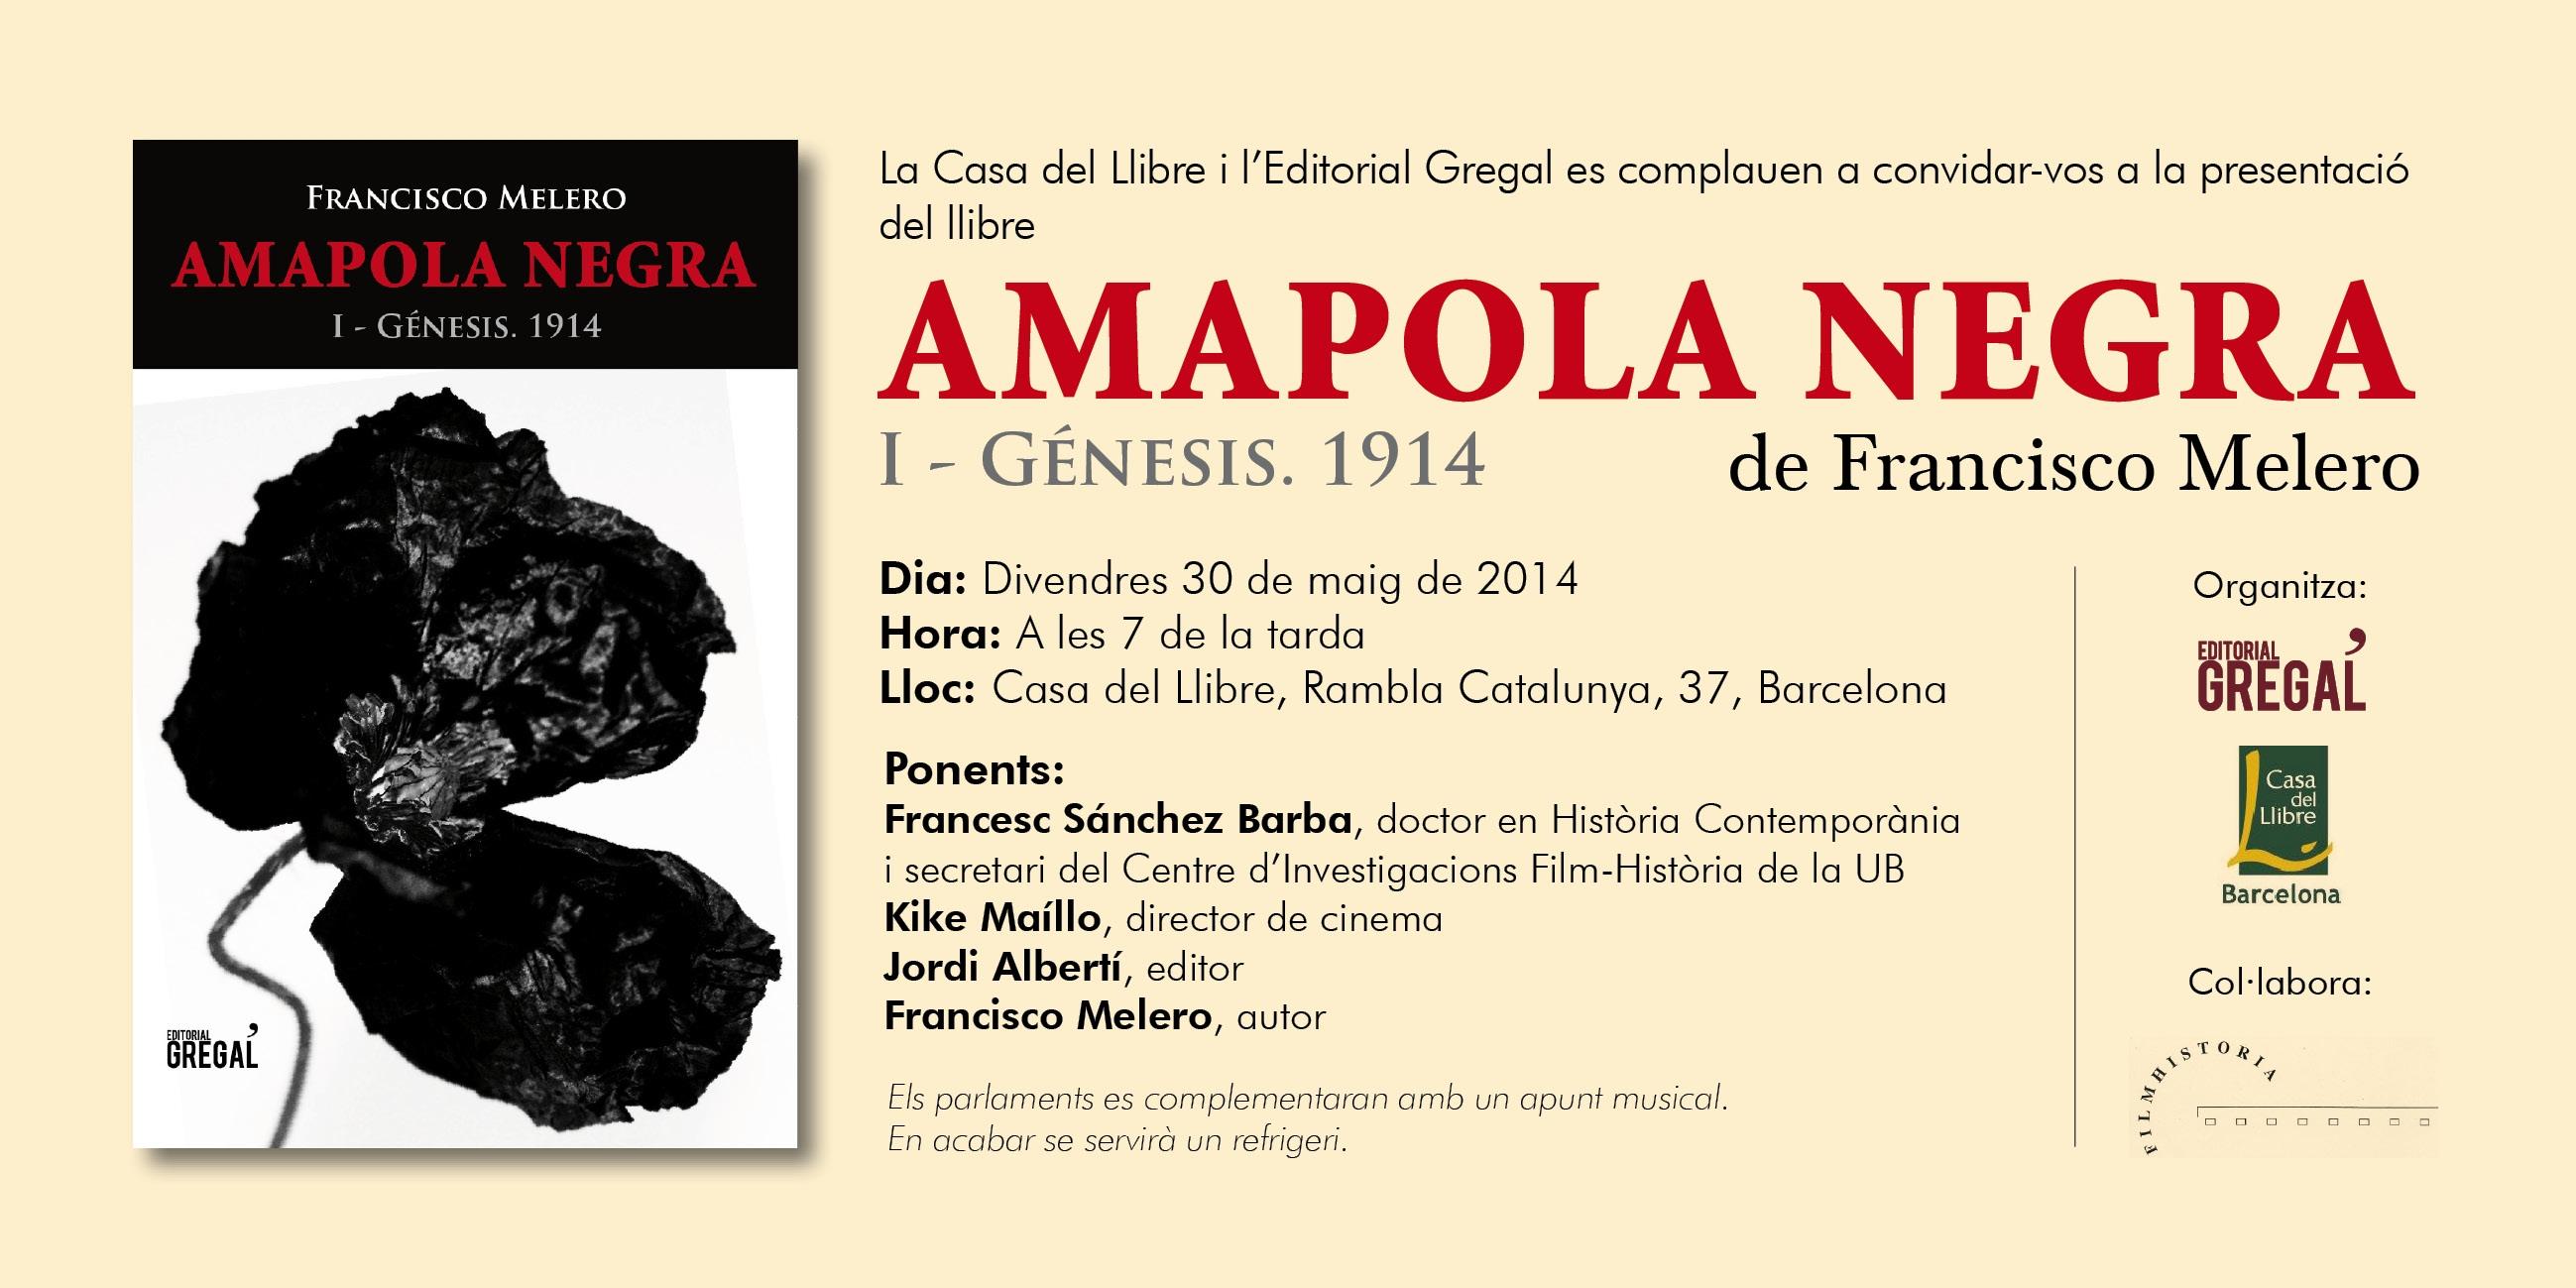 Francisco melero p gina web oficial del escritor agenda - Casa del libro barcelona rambla catalunya ...